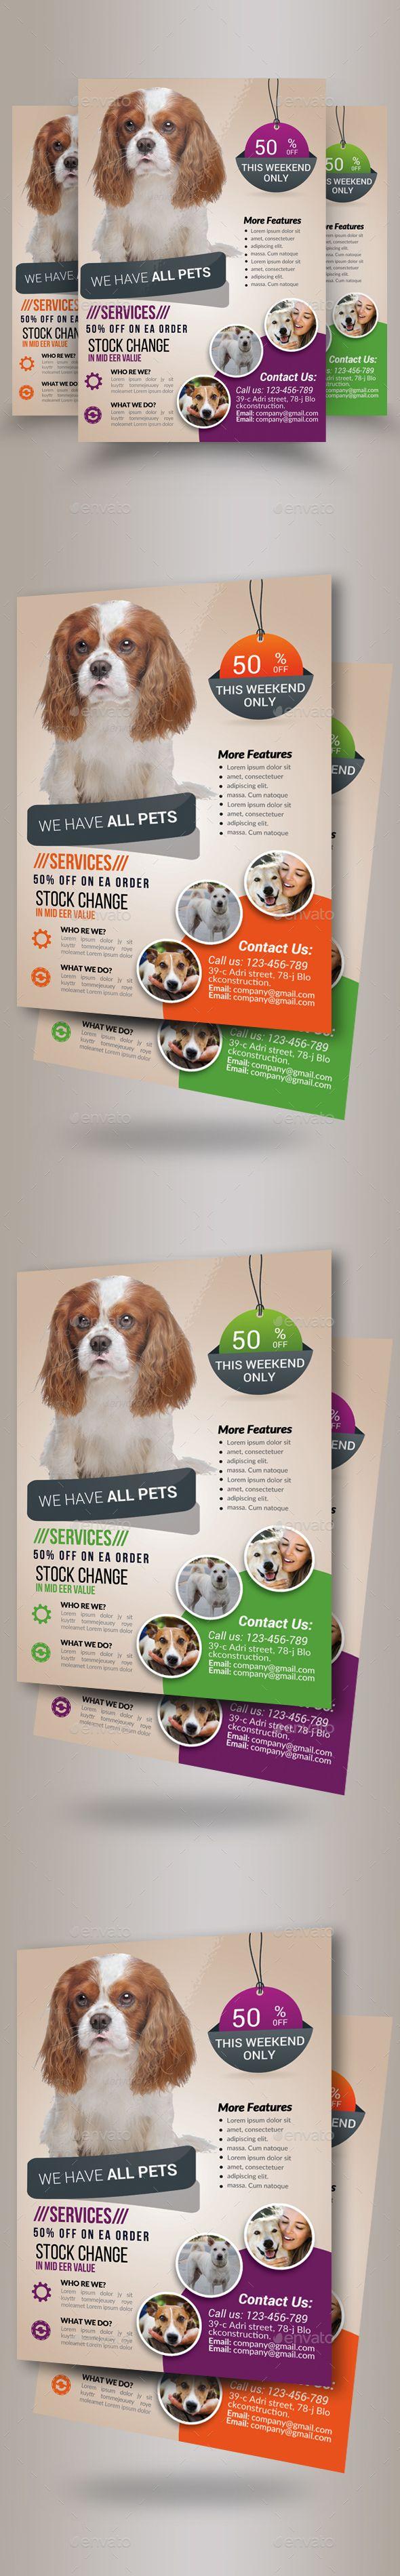 Pet Shop Business Flyer Template PSD. Download here: http://graphicriver.net/item/pet-shop-business-flyer-template/16145161?ref=ksioks